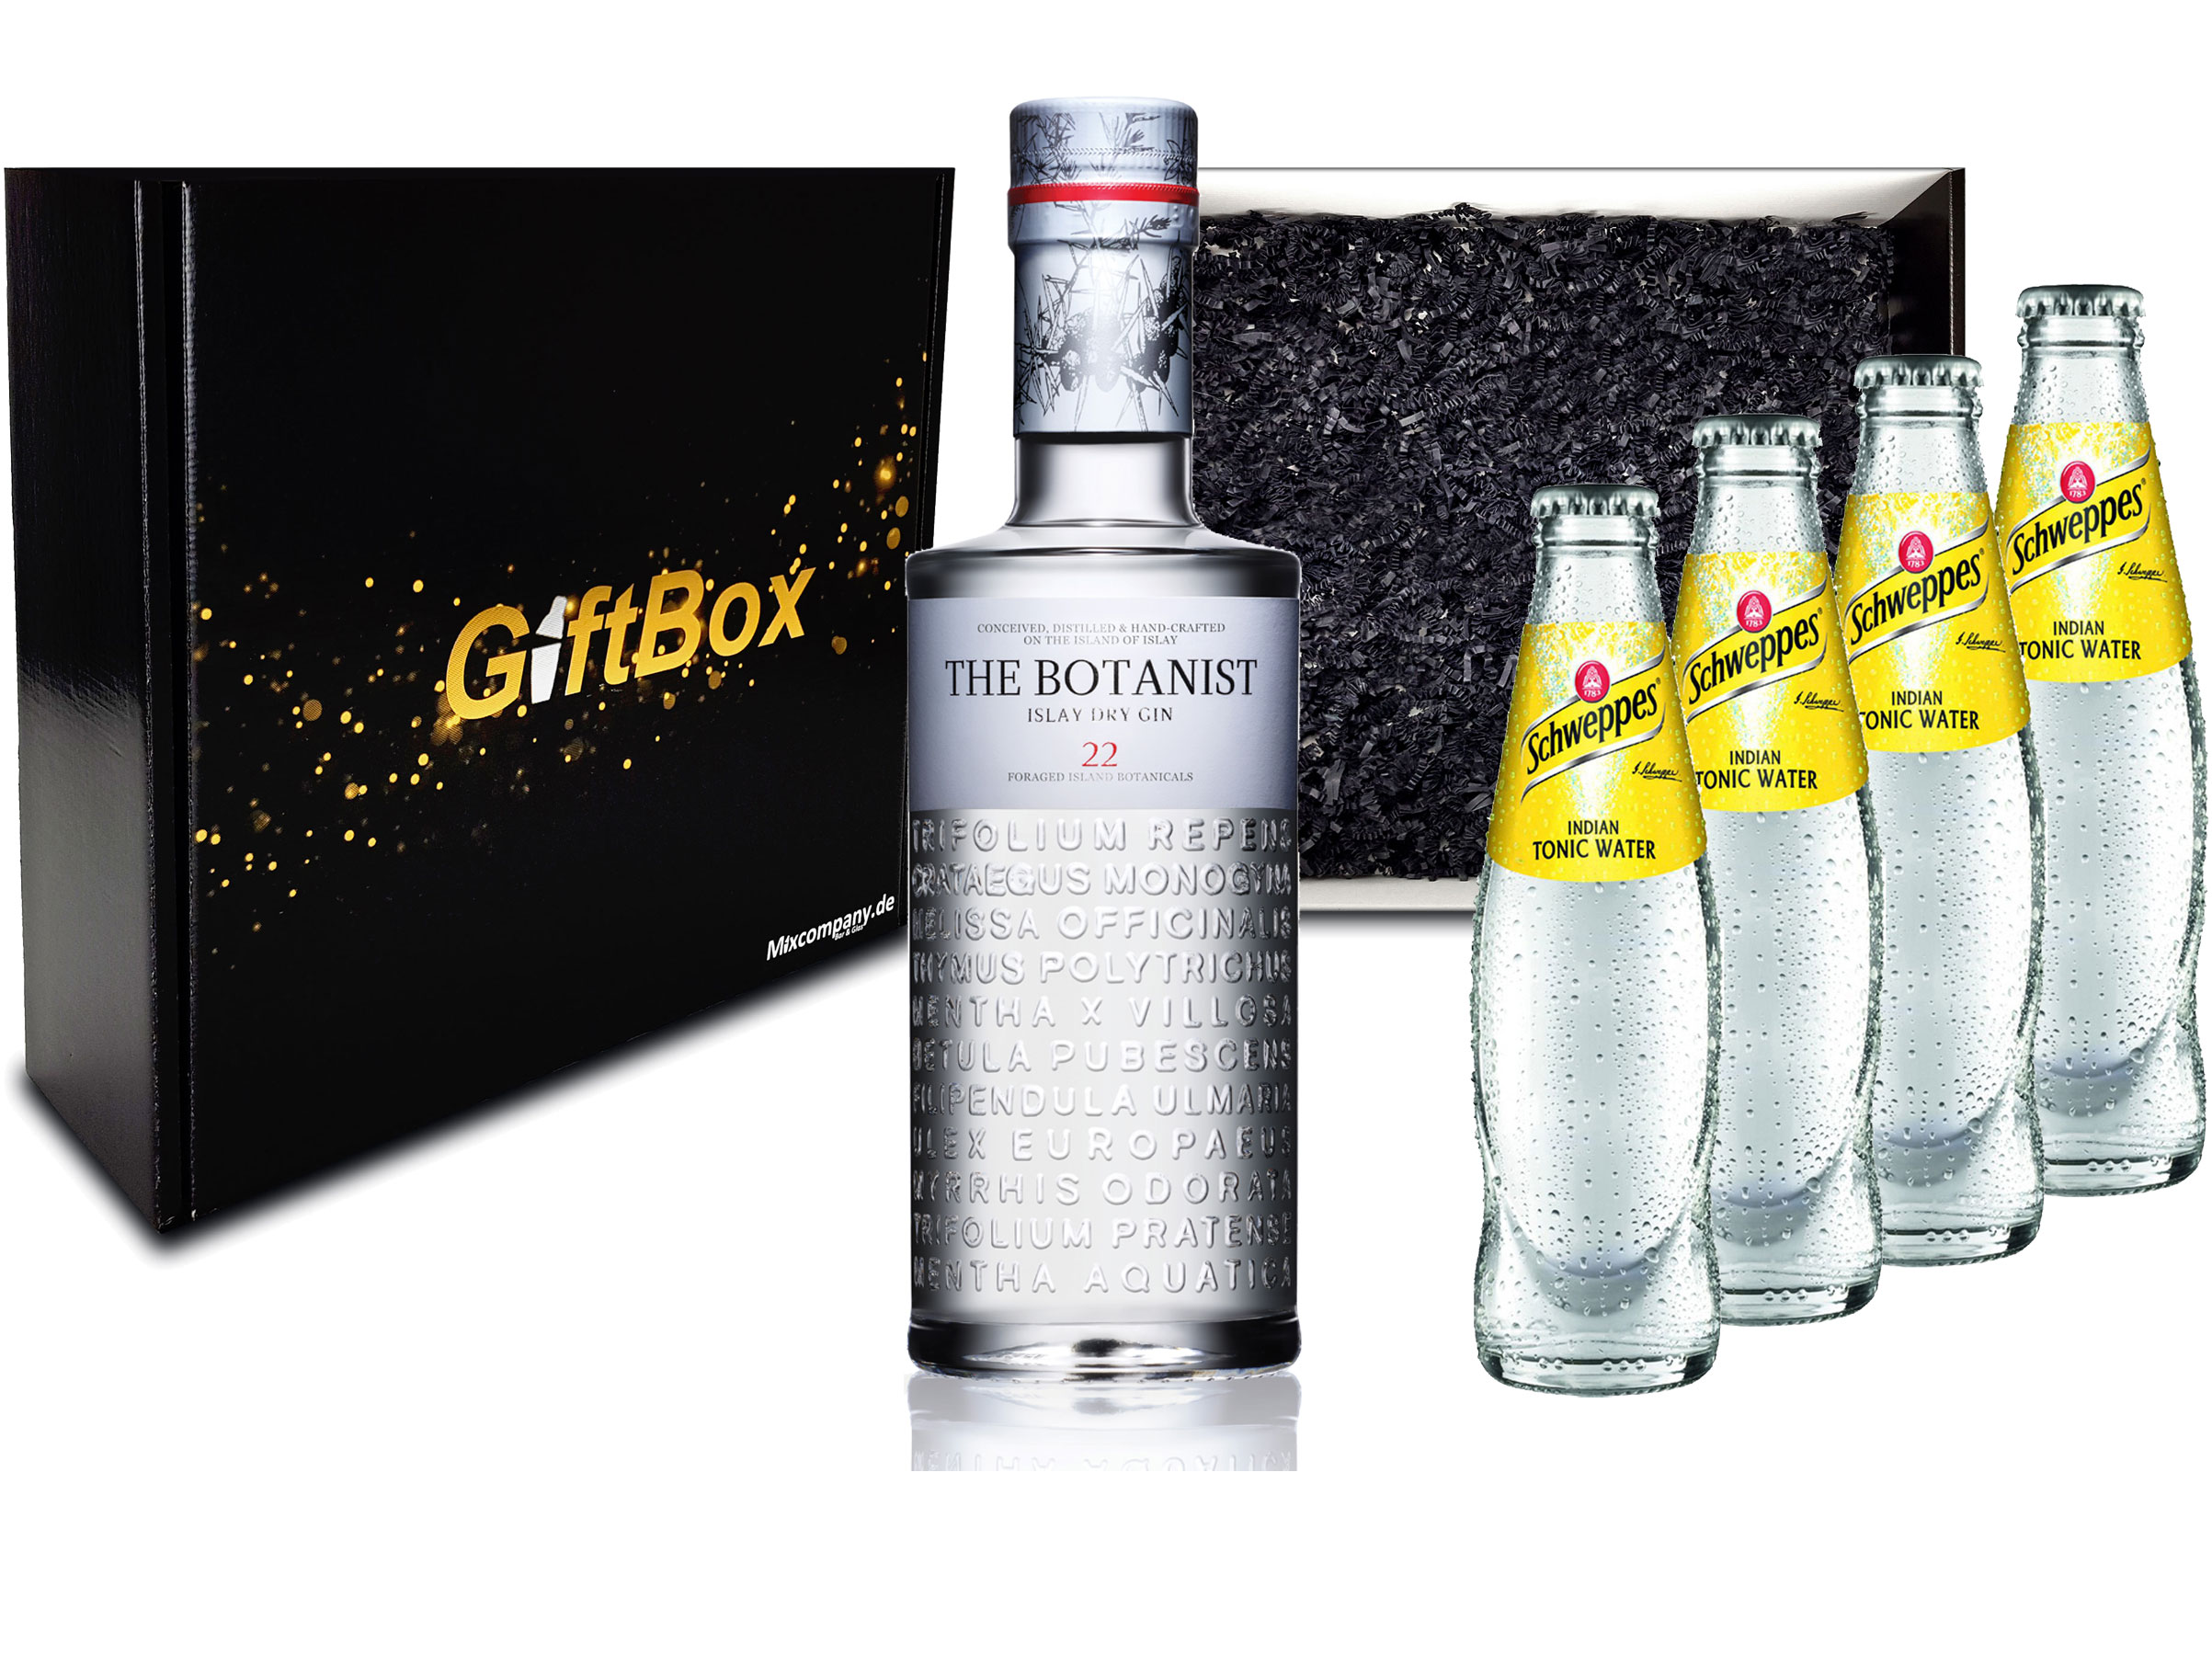 Gin Tonic Giftbox Geschenkset - The Botanist Islay Dry Gin 0,7l 700ml (46% Vol) + 4x Schweppes Tonic Water 200ml inkl. Pfand MEHRWEG + Geschenkverpackung